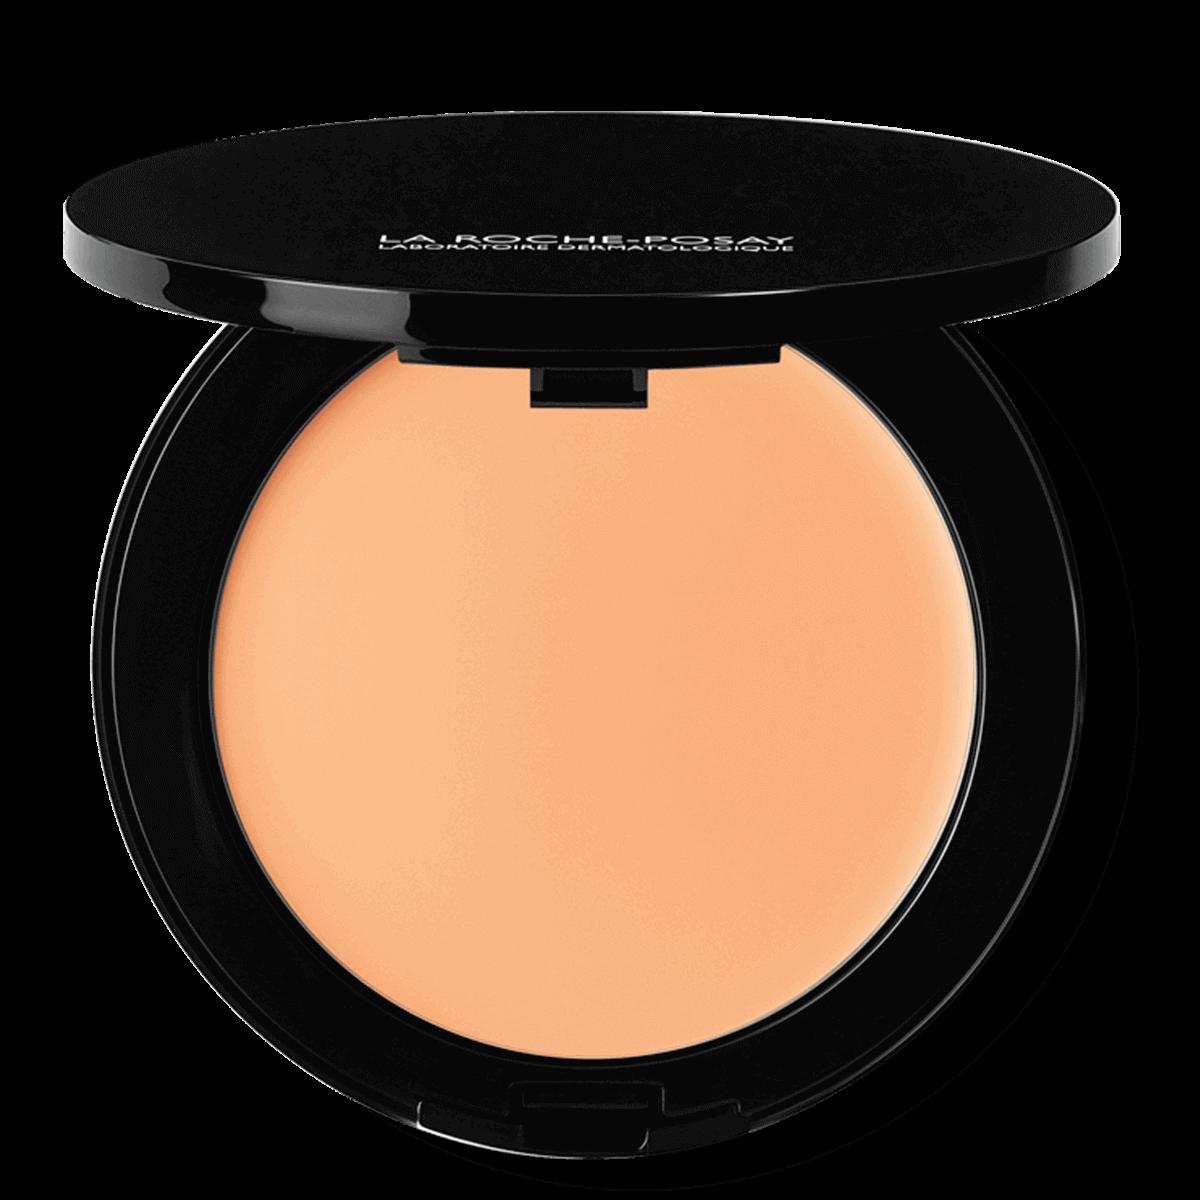 La Roche Posay Sensitiv Toleriane Makeup KOMPAKT CREME 10 Elfenben 33378